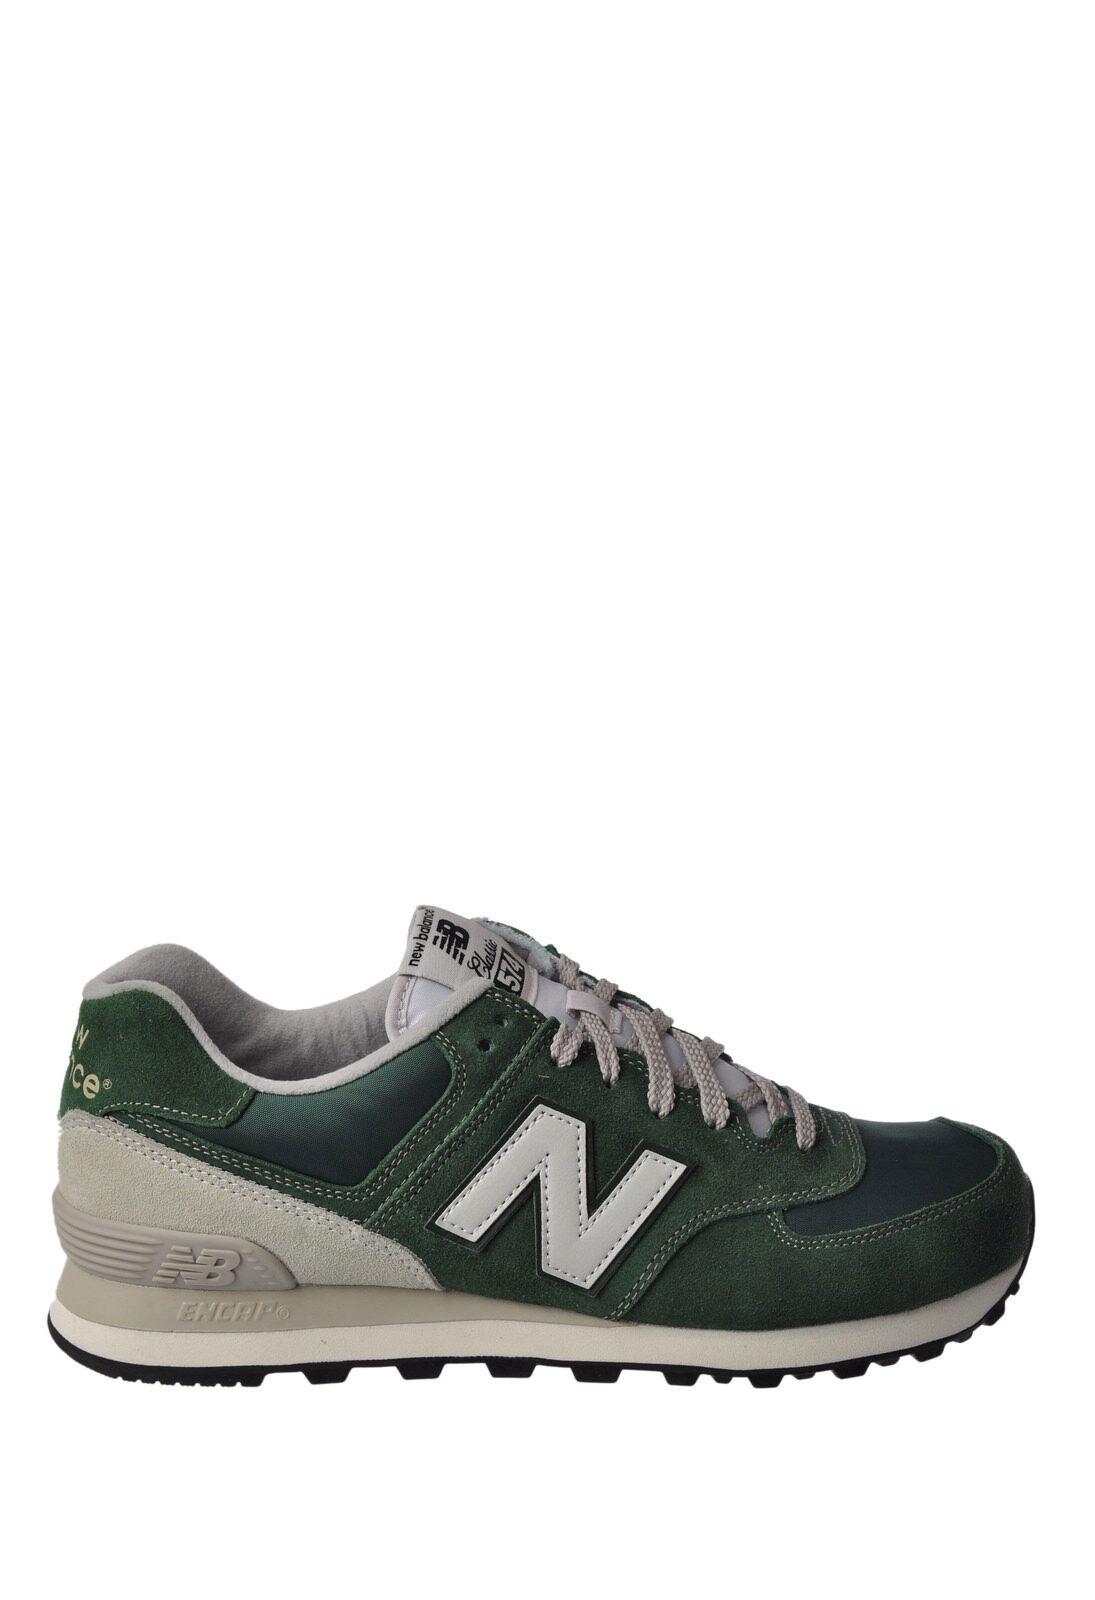 Scarpe casual da uomo  New Balance - Shoes-Sneakers low - Man - Green - 892410H184328